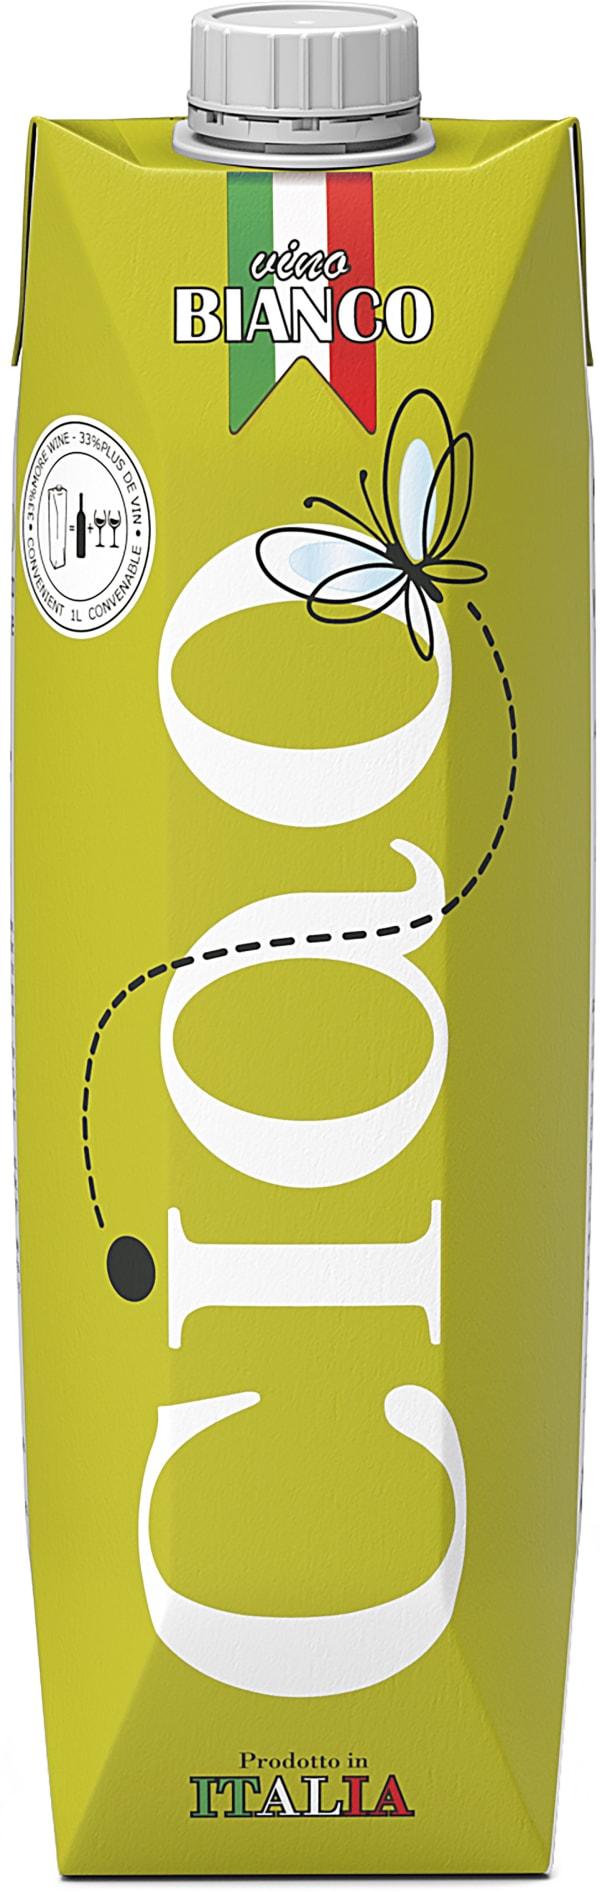 Ciao Organic Chardonnay kartongförpackning